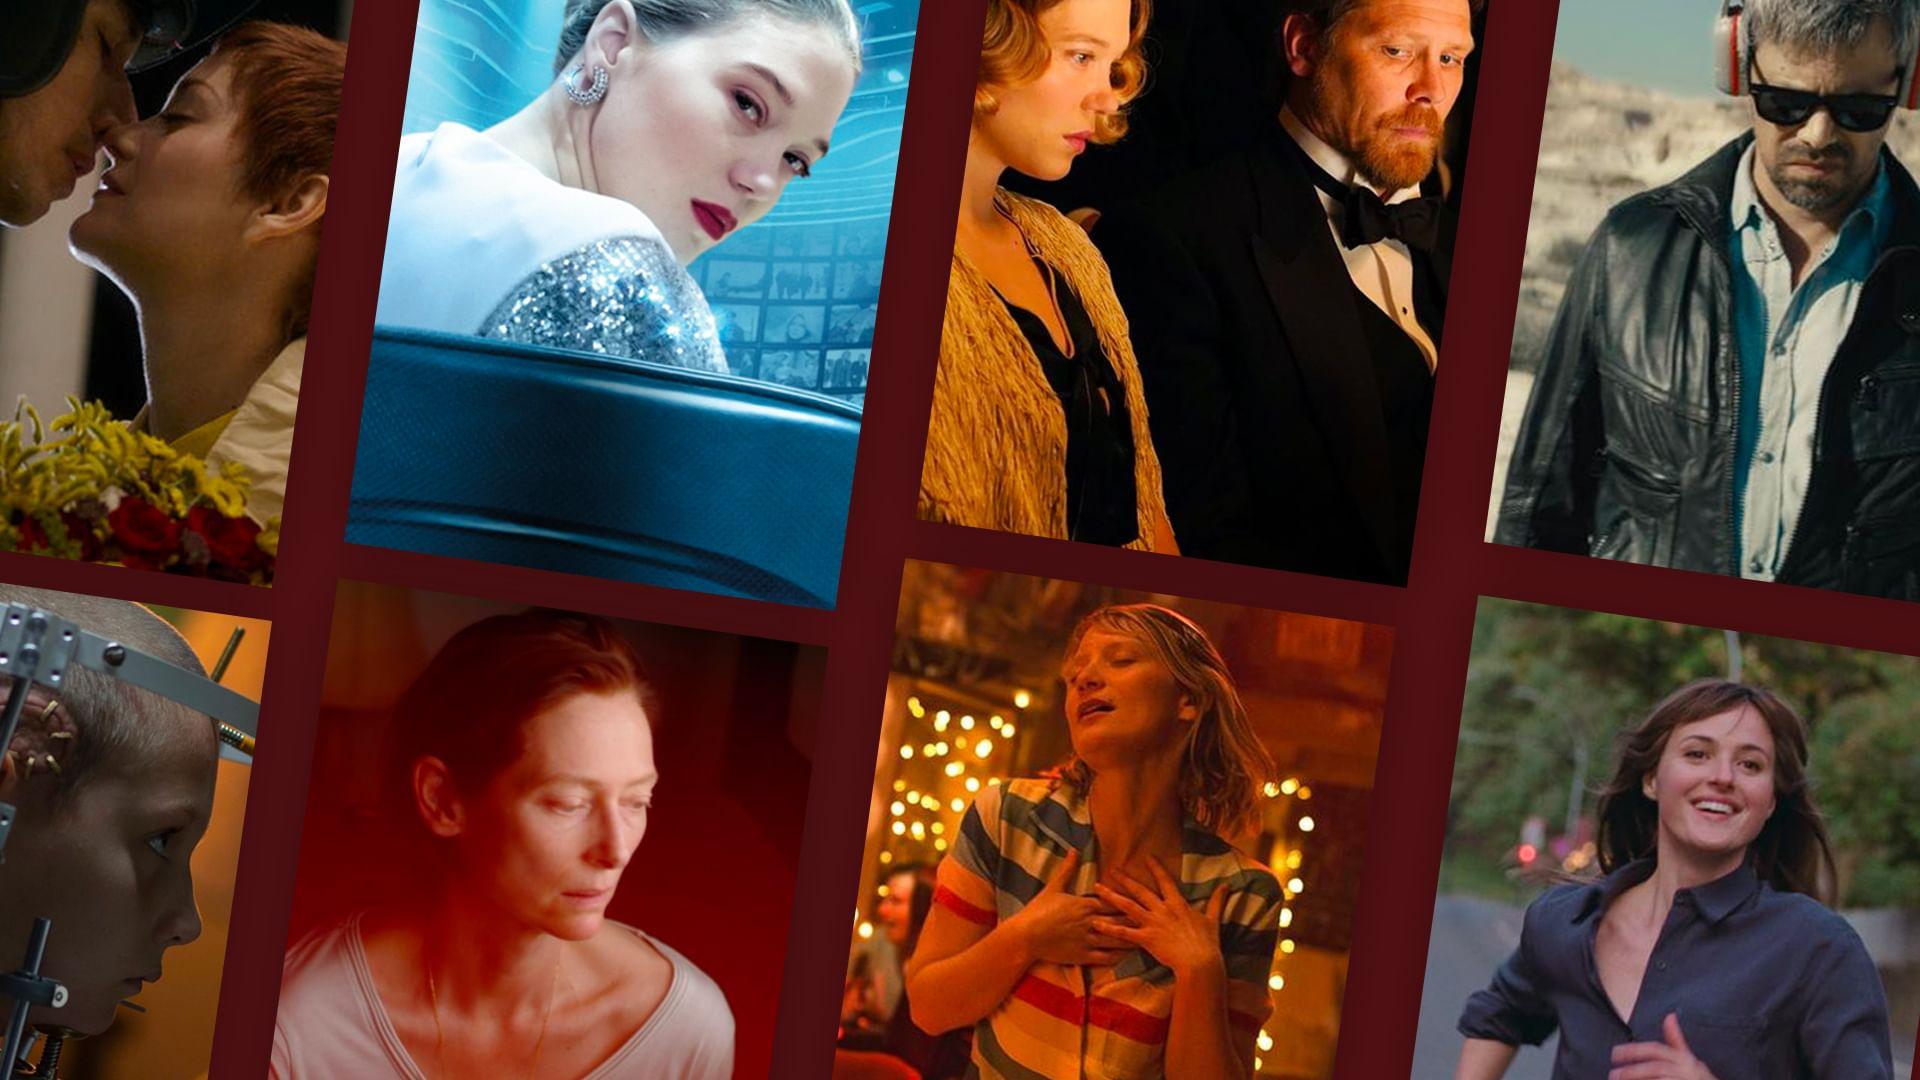 ARTE beim Filmfestival Cannes